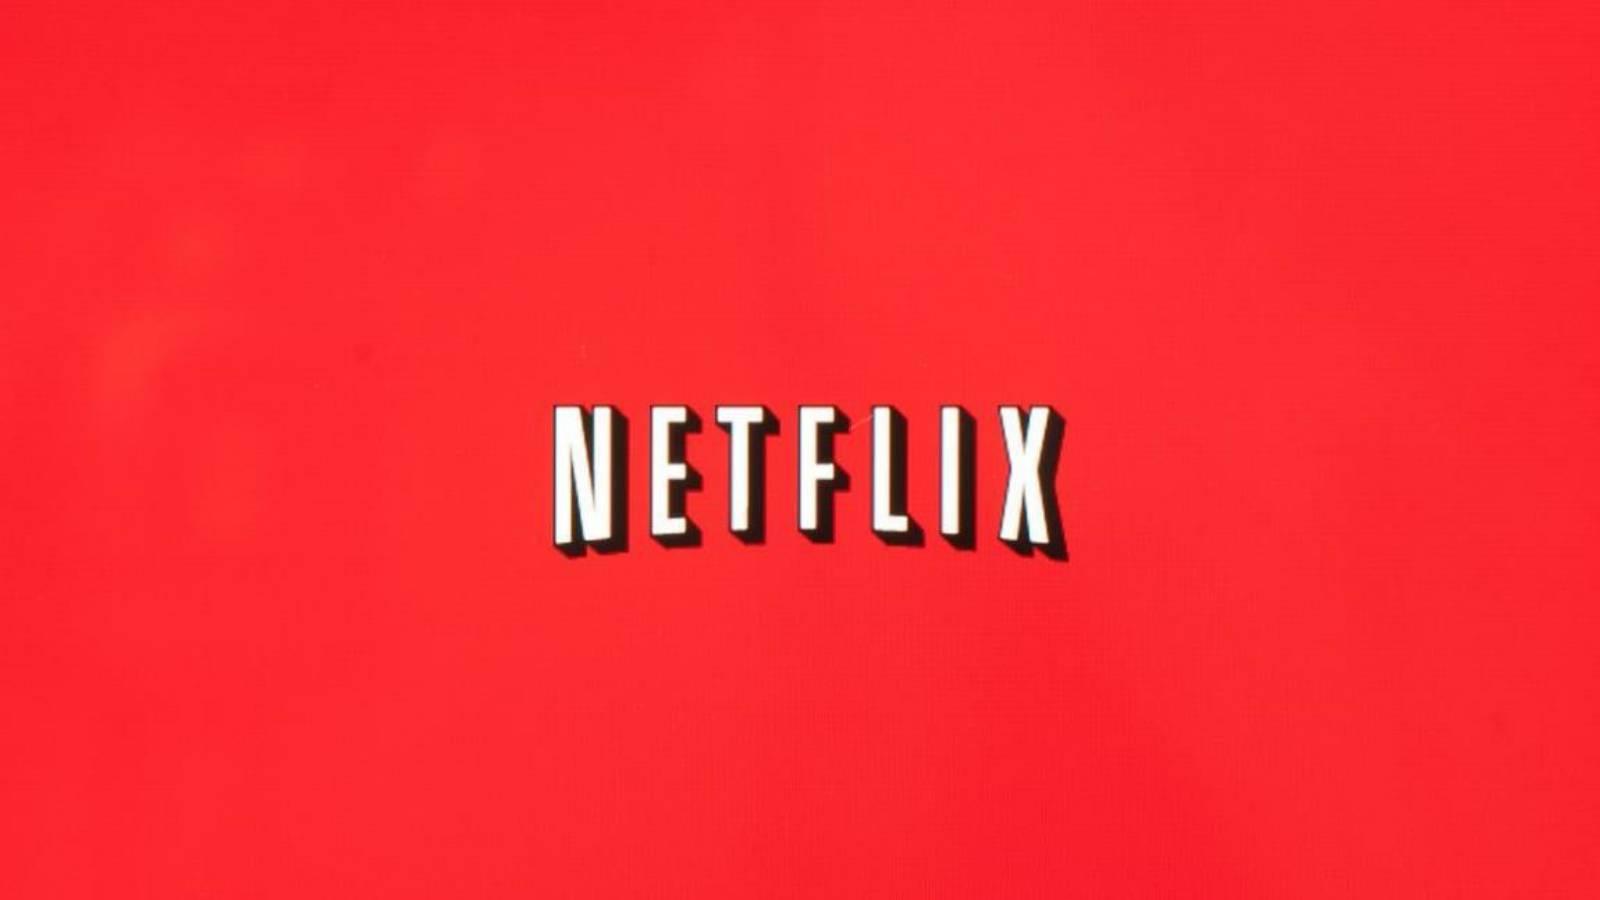 Netflix aleator